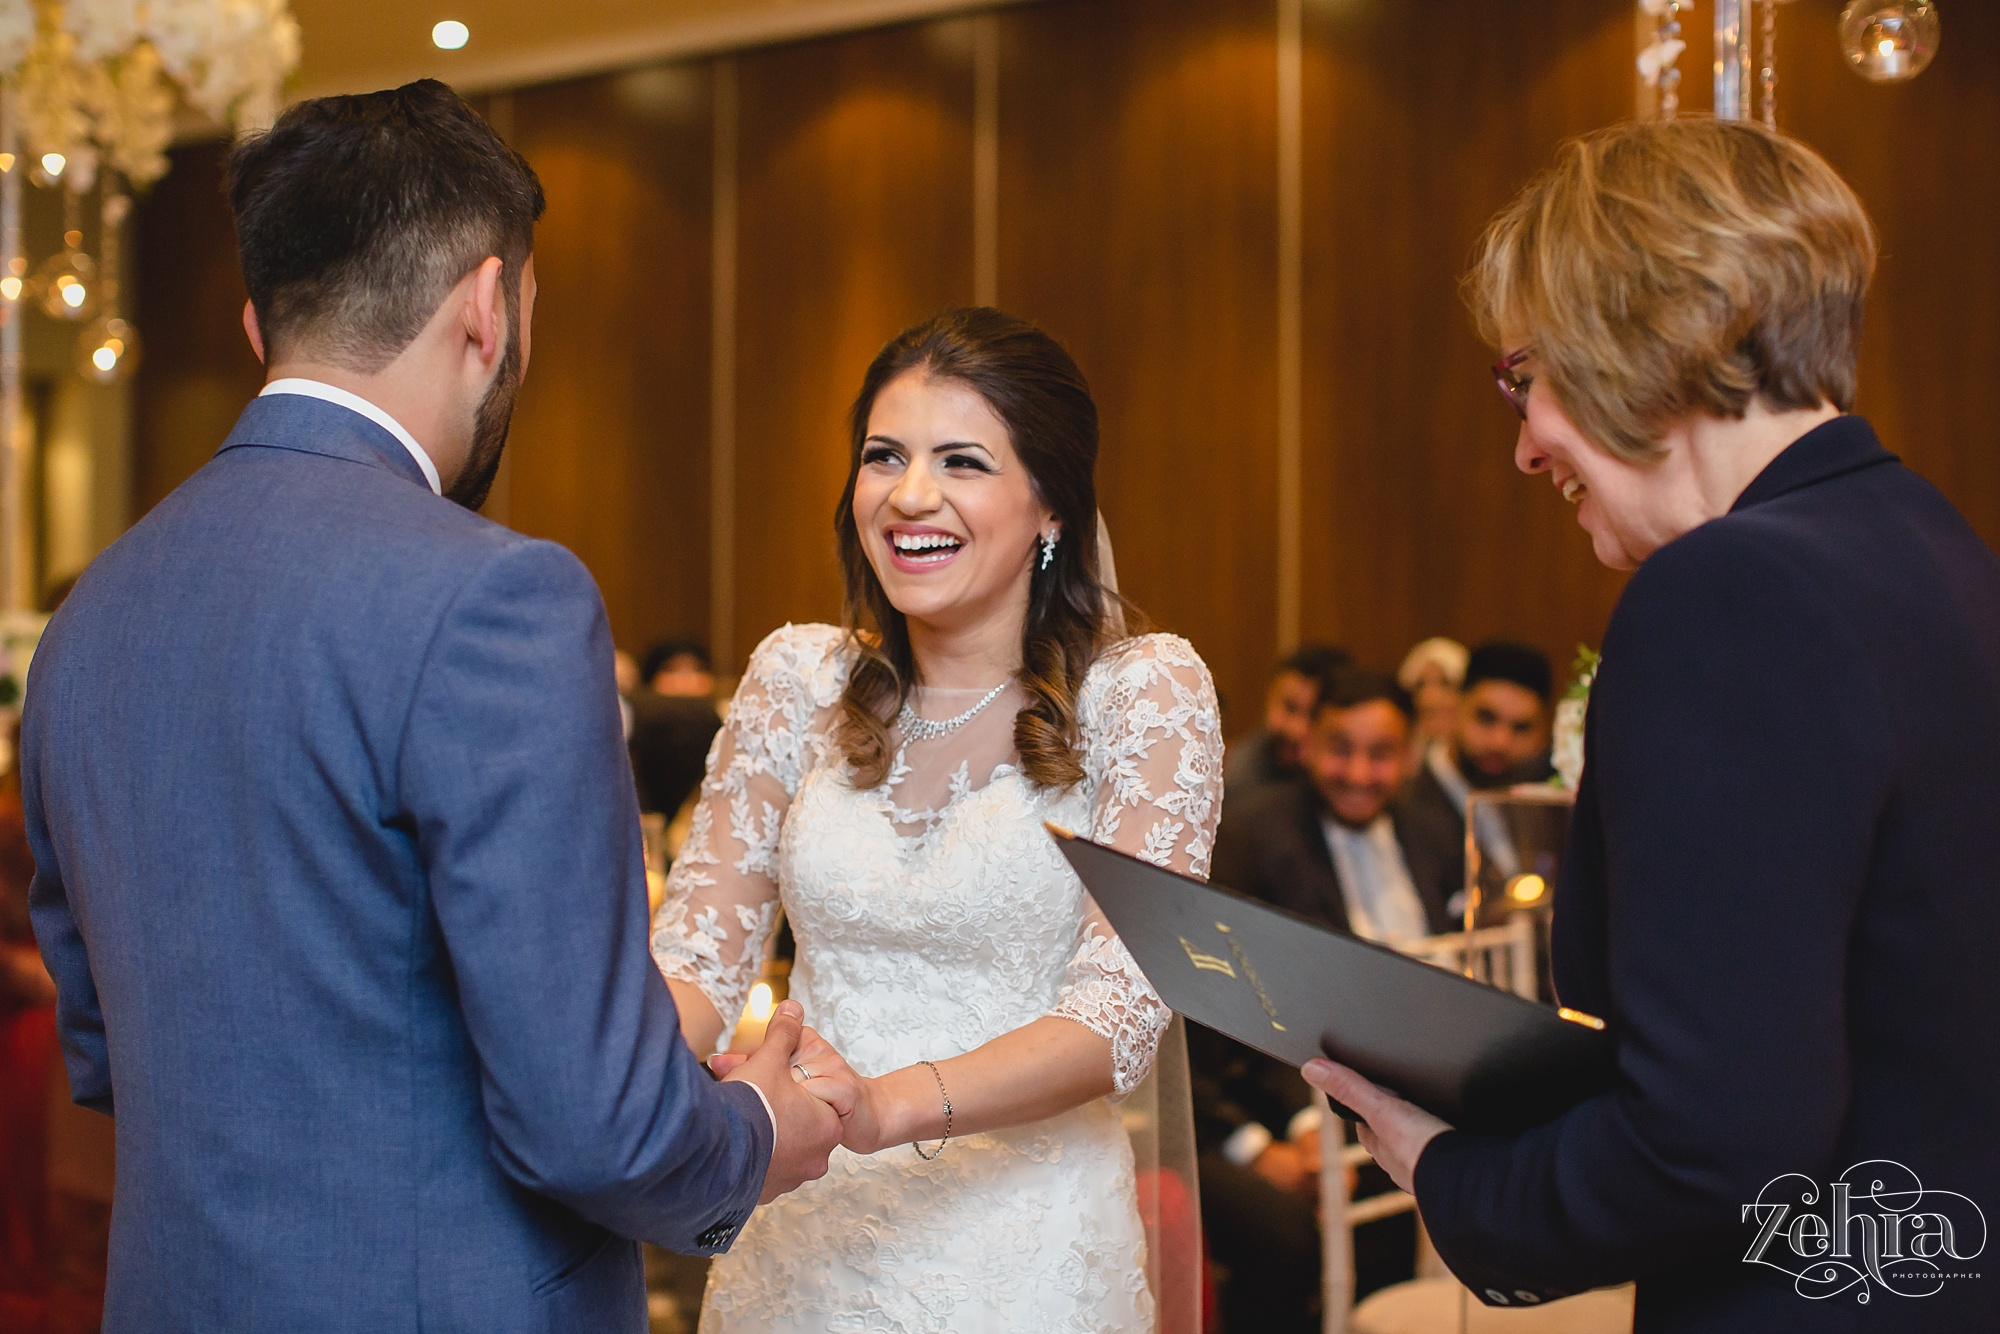 zehra photographer mere cheshire wedding_0015.jpg